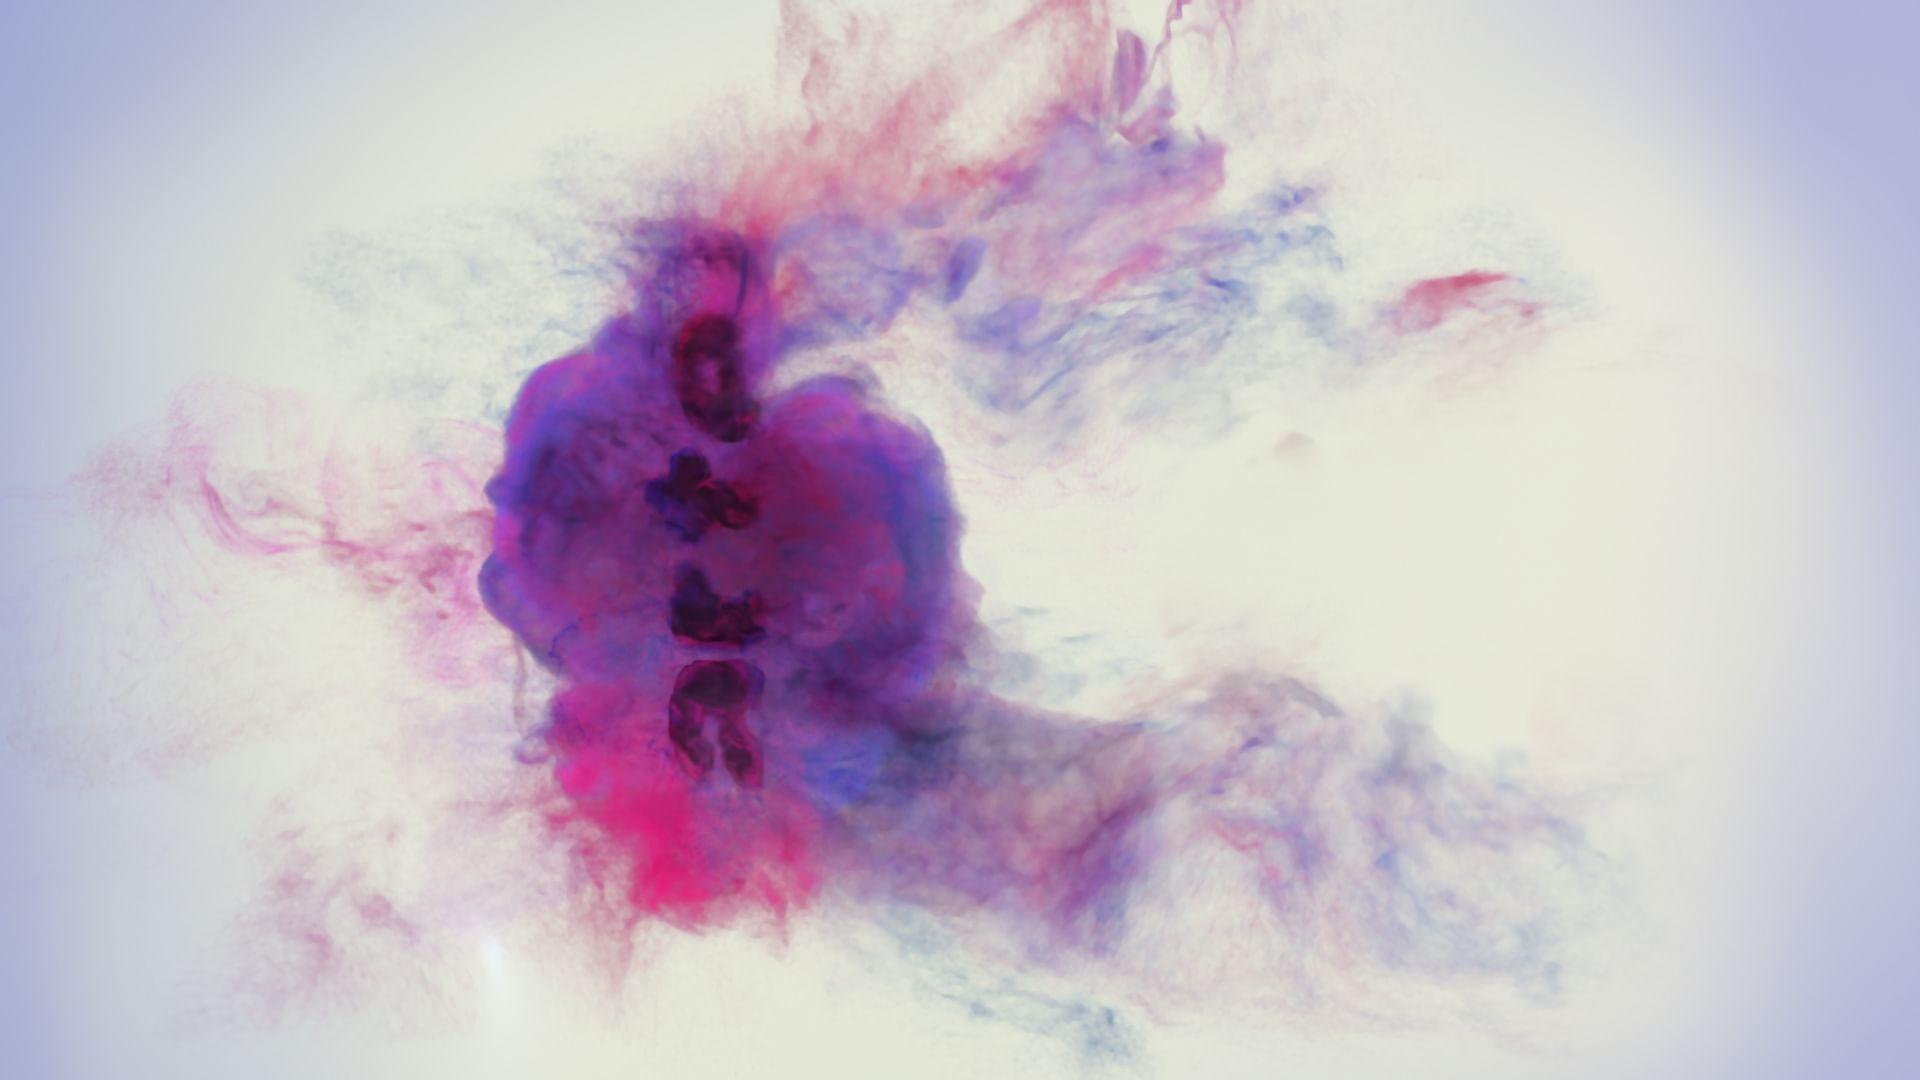 Paare – Heike Makatsch/Fahri Yardim (Serie, D 2013, St. 1)